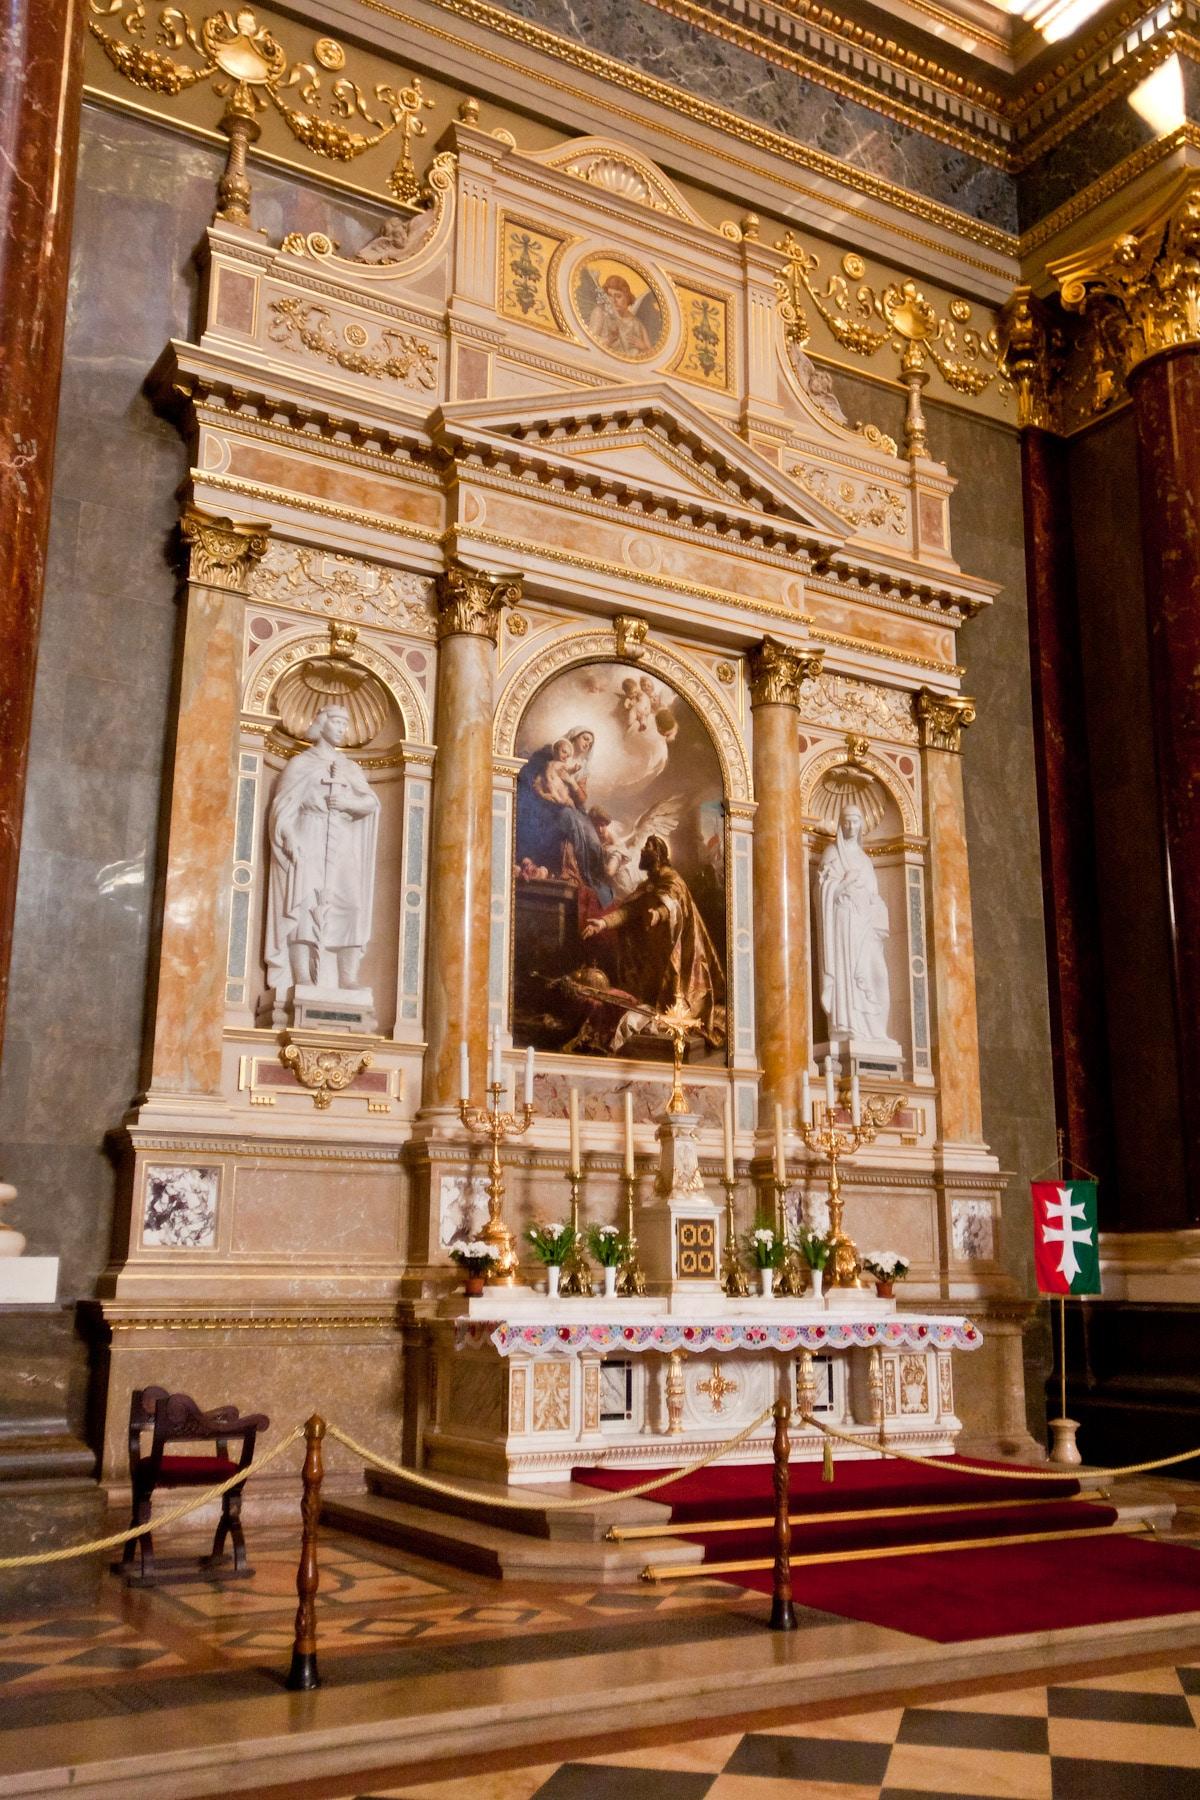 St Stephen's Basilica